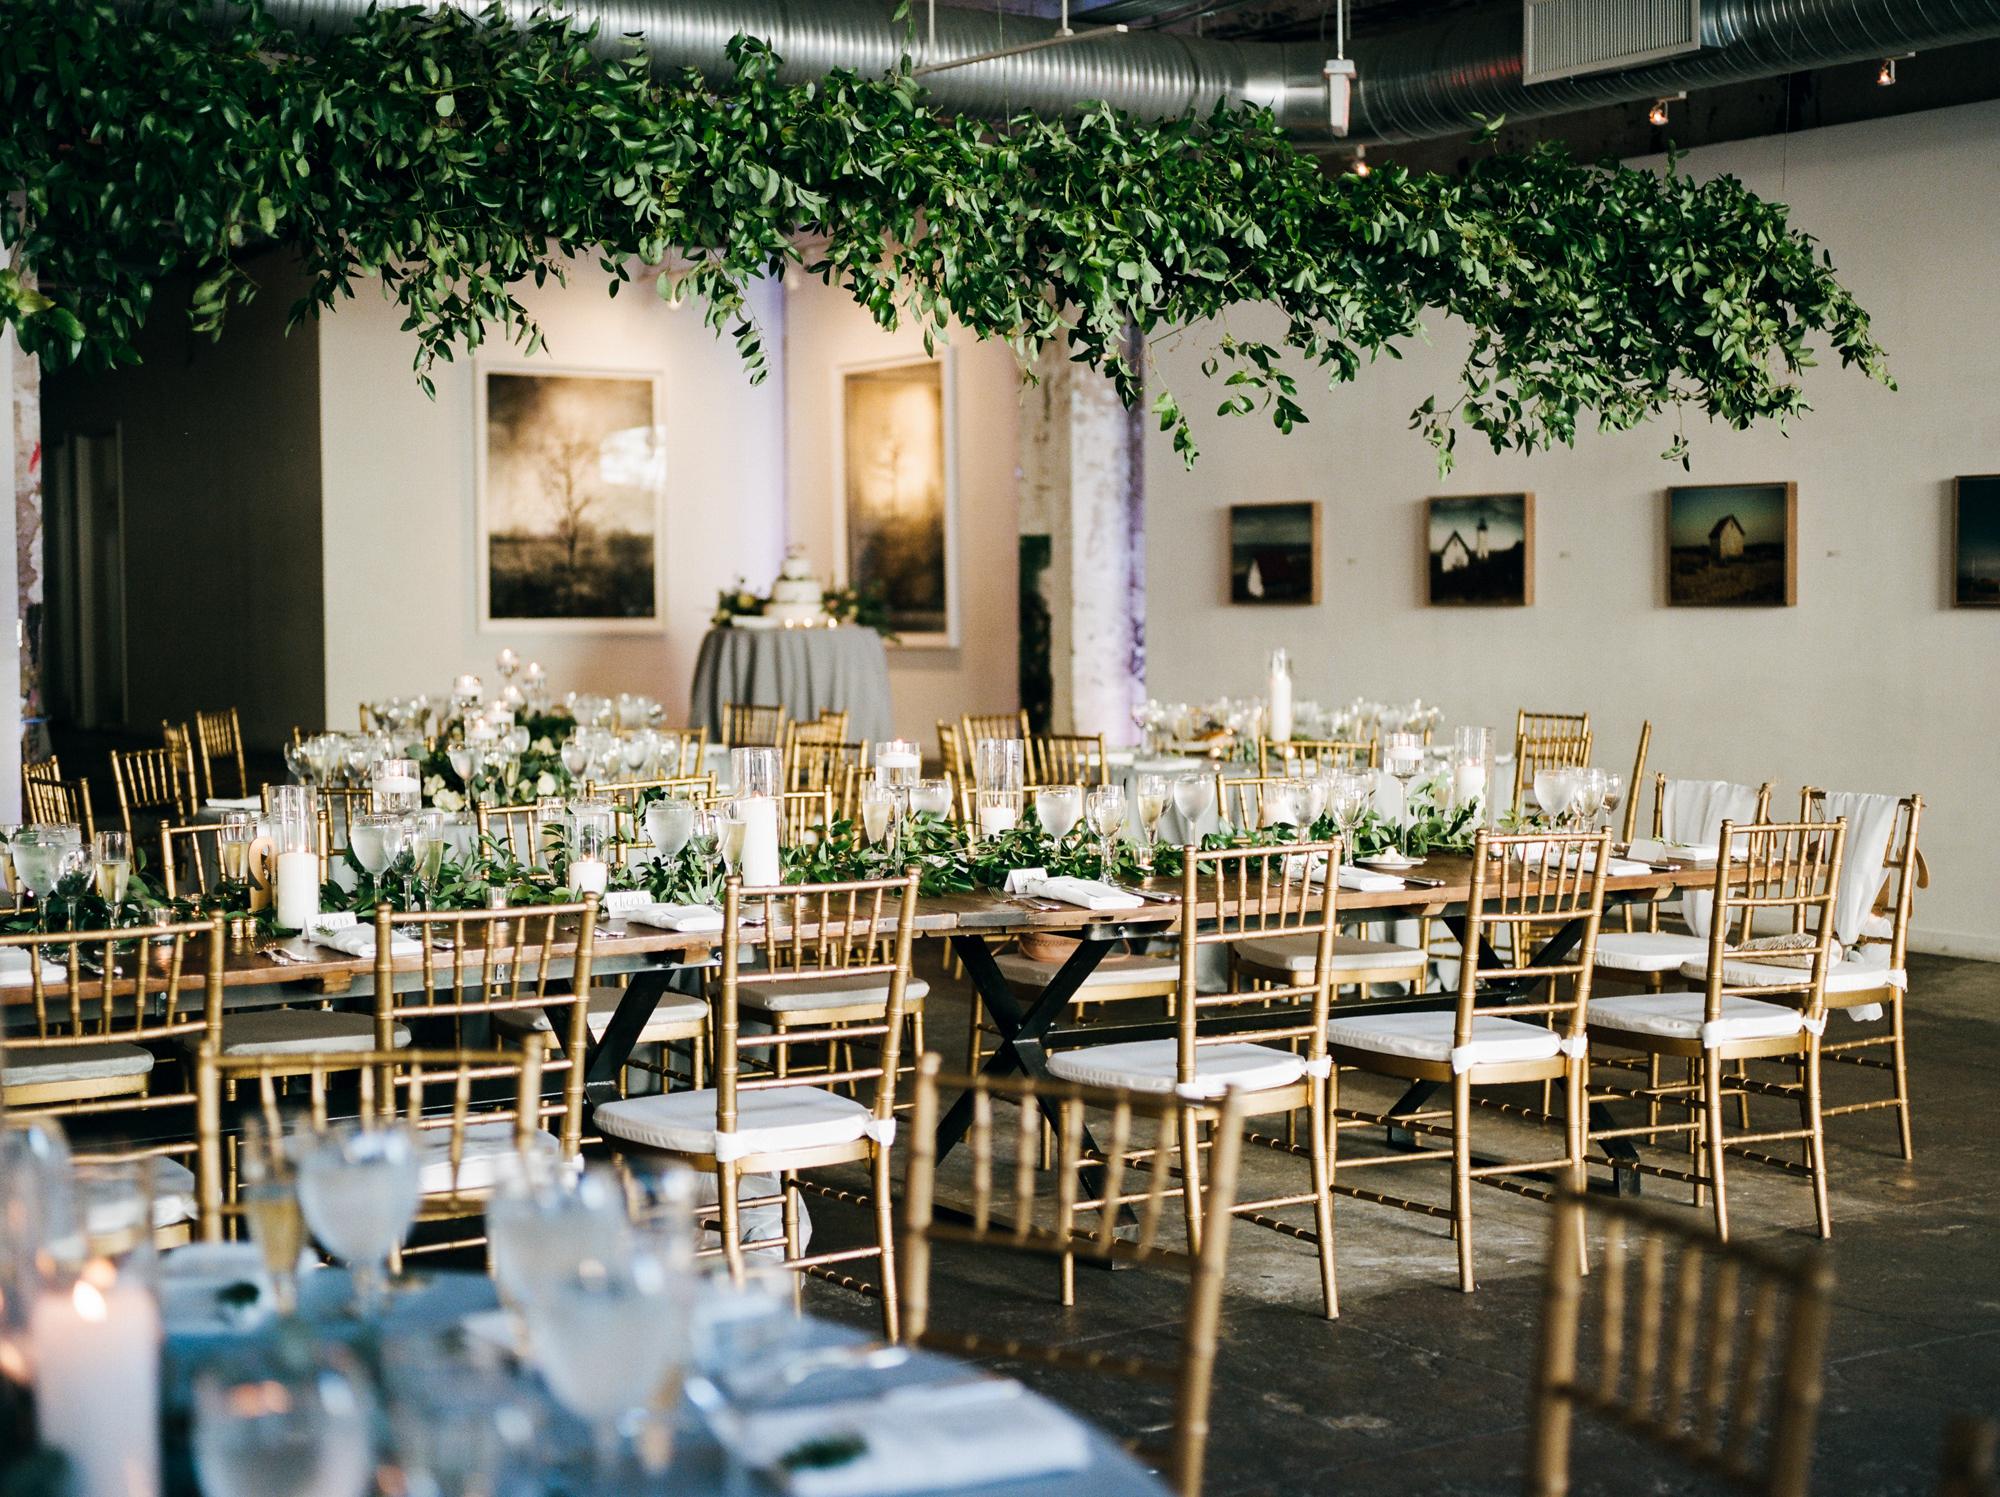 LongView-Gallery-Wedding-Art-Washington-DC-Film-Photographer-42.jpg